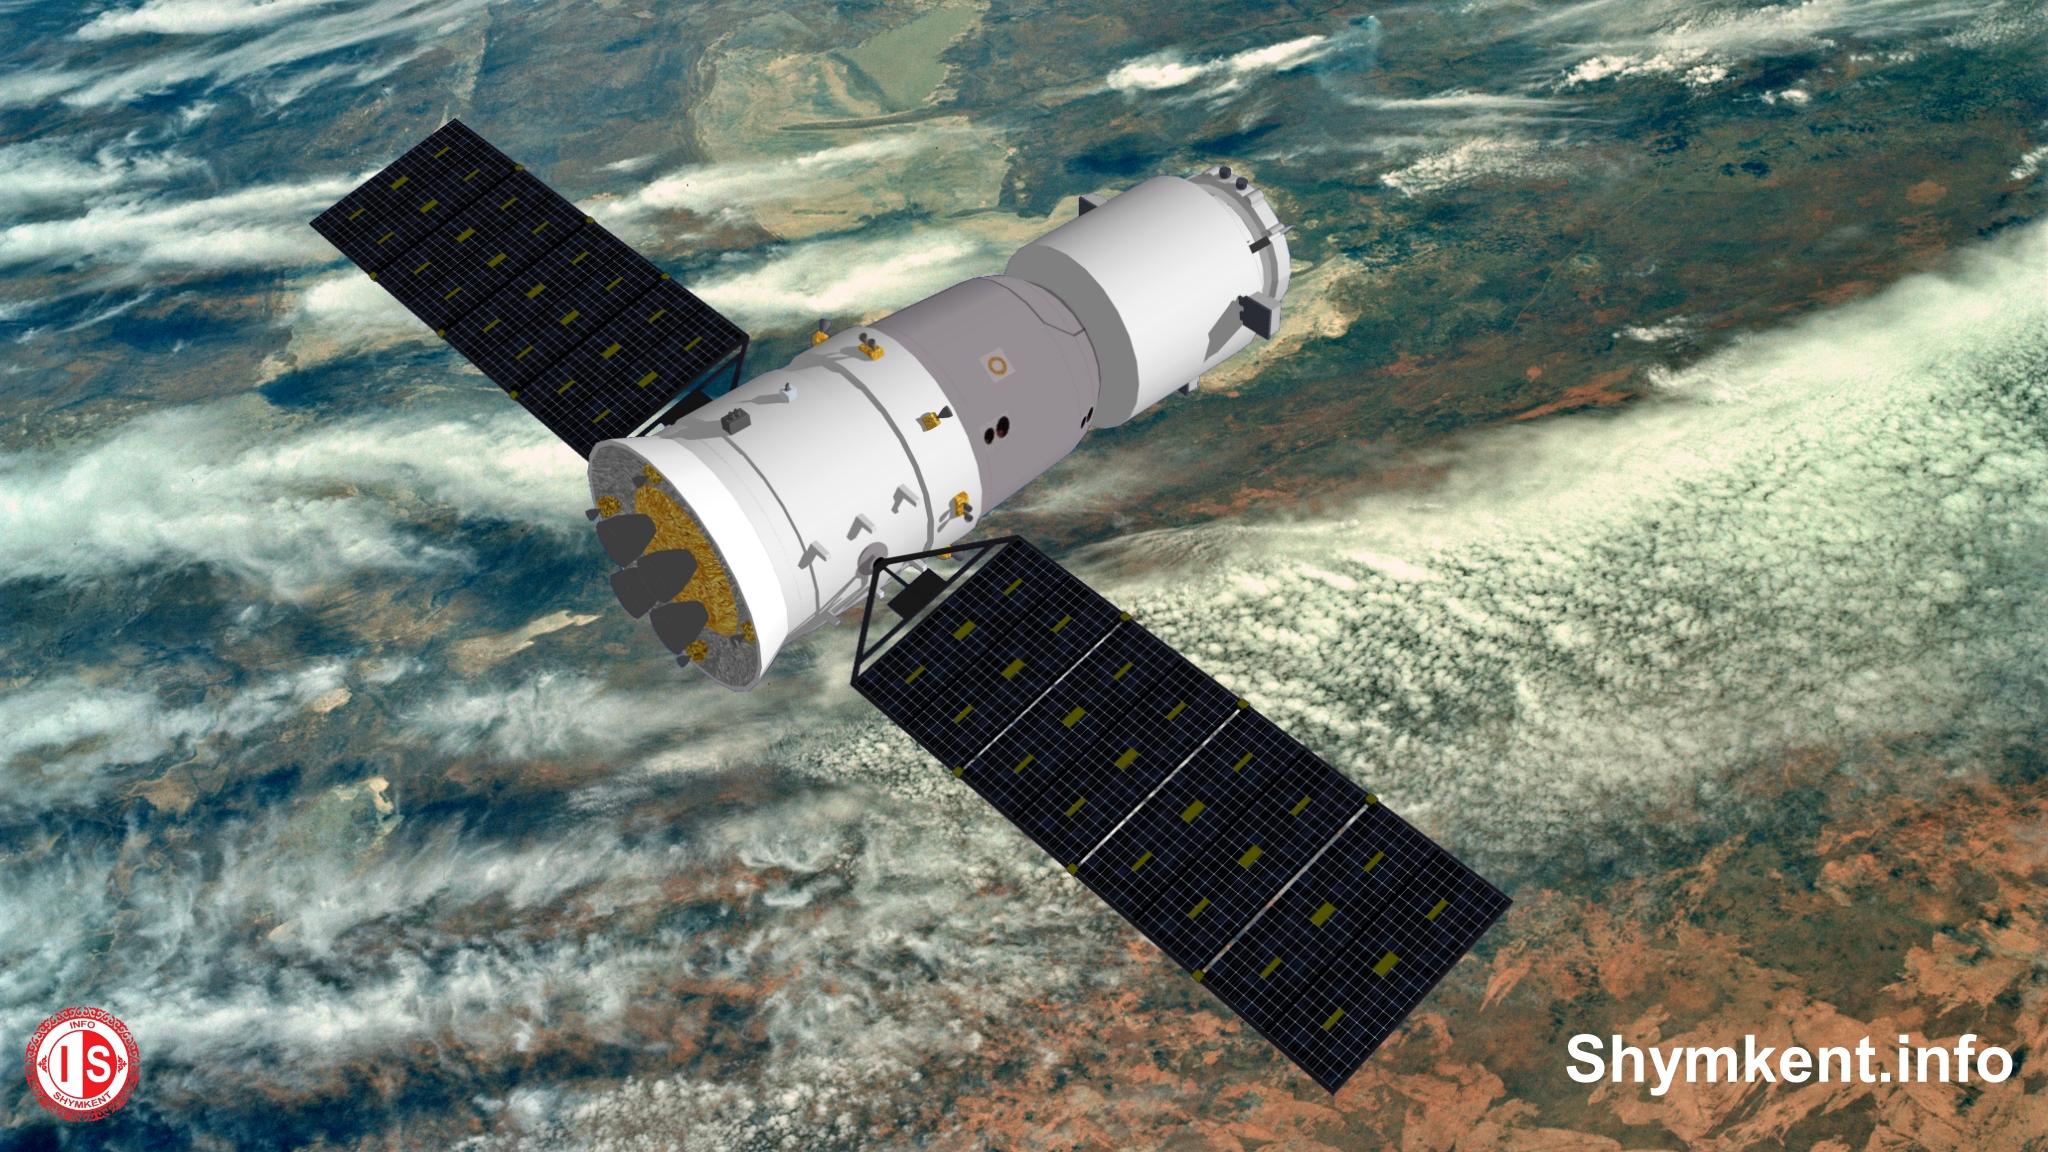 Info Shymkent - Chinas crewed Shenzhou spacecraft